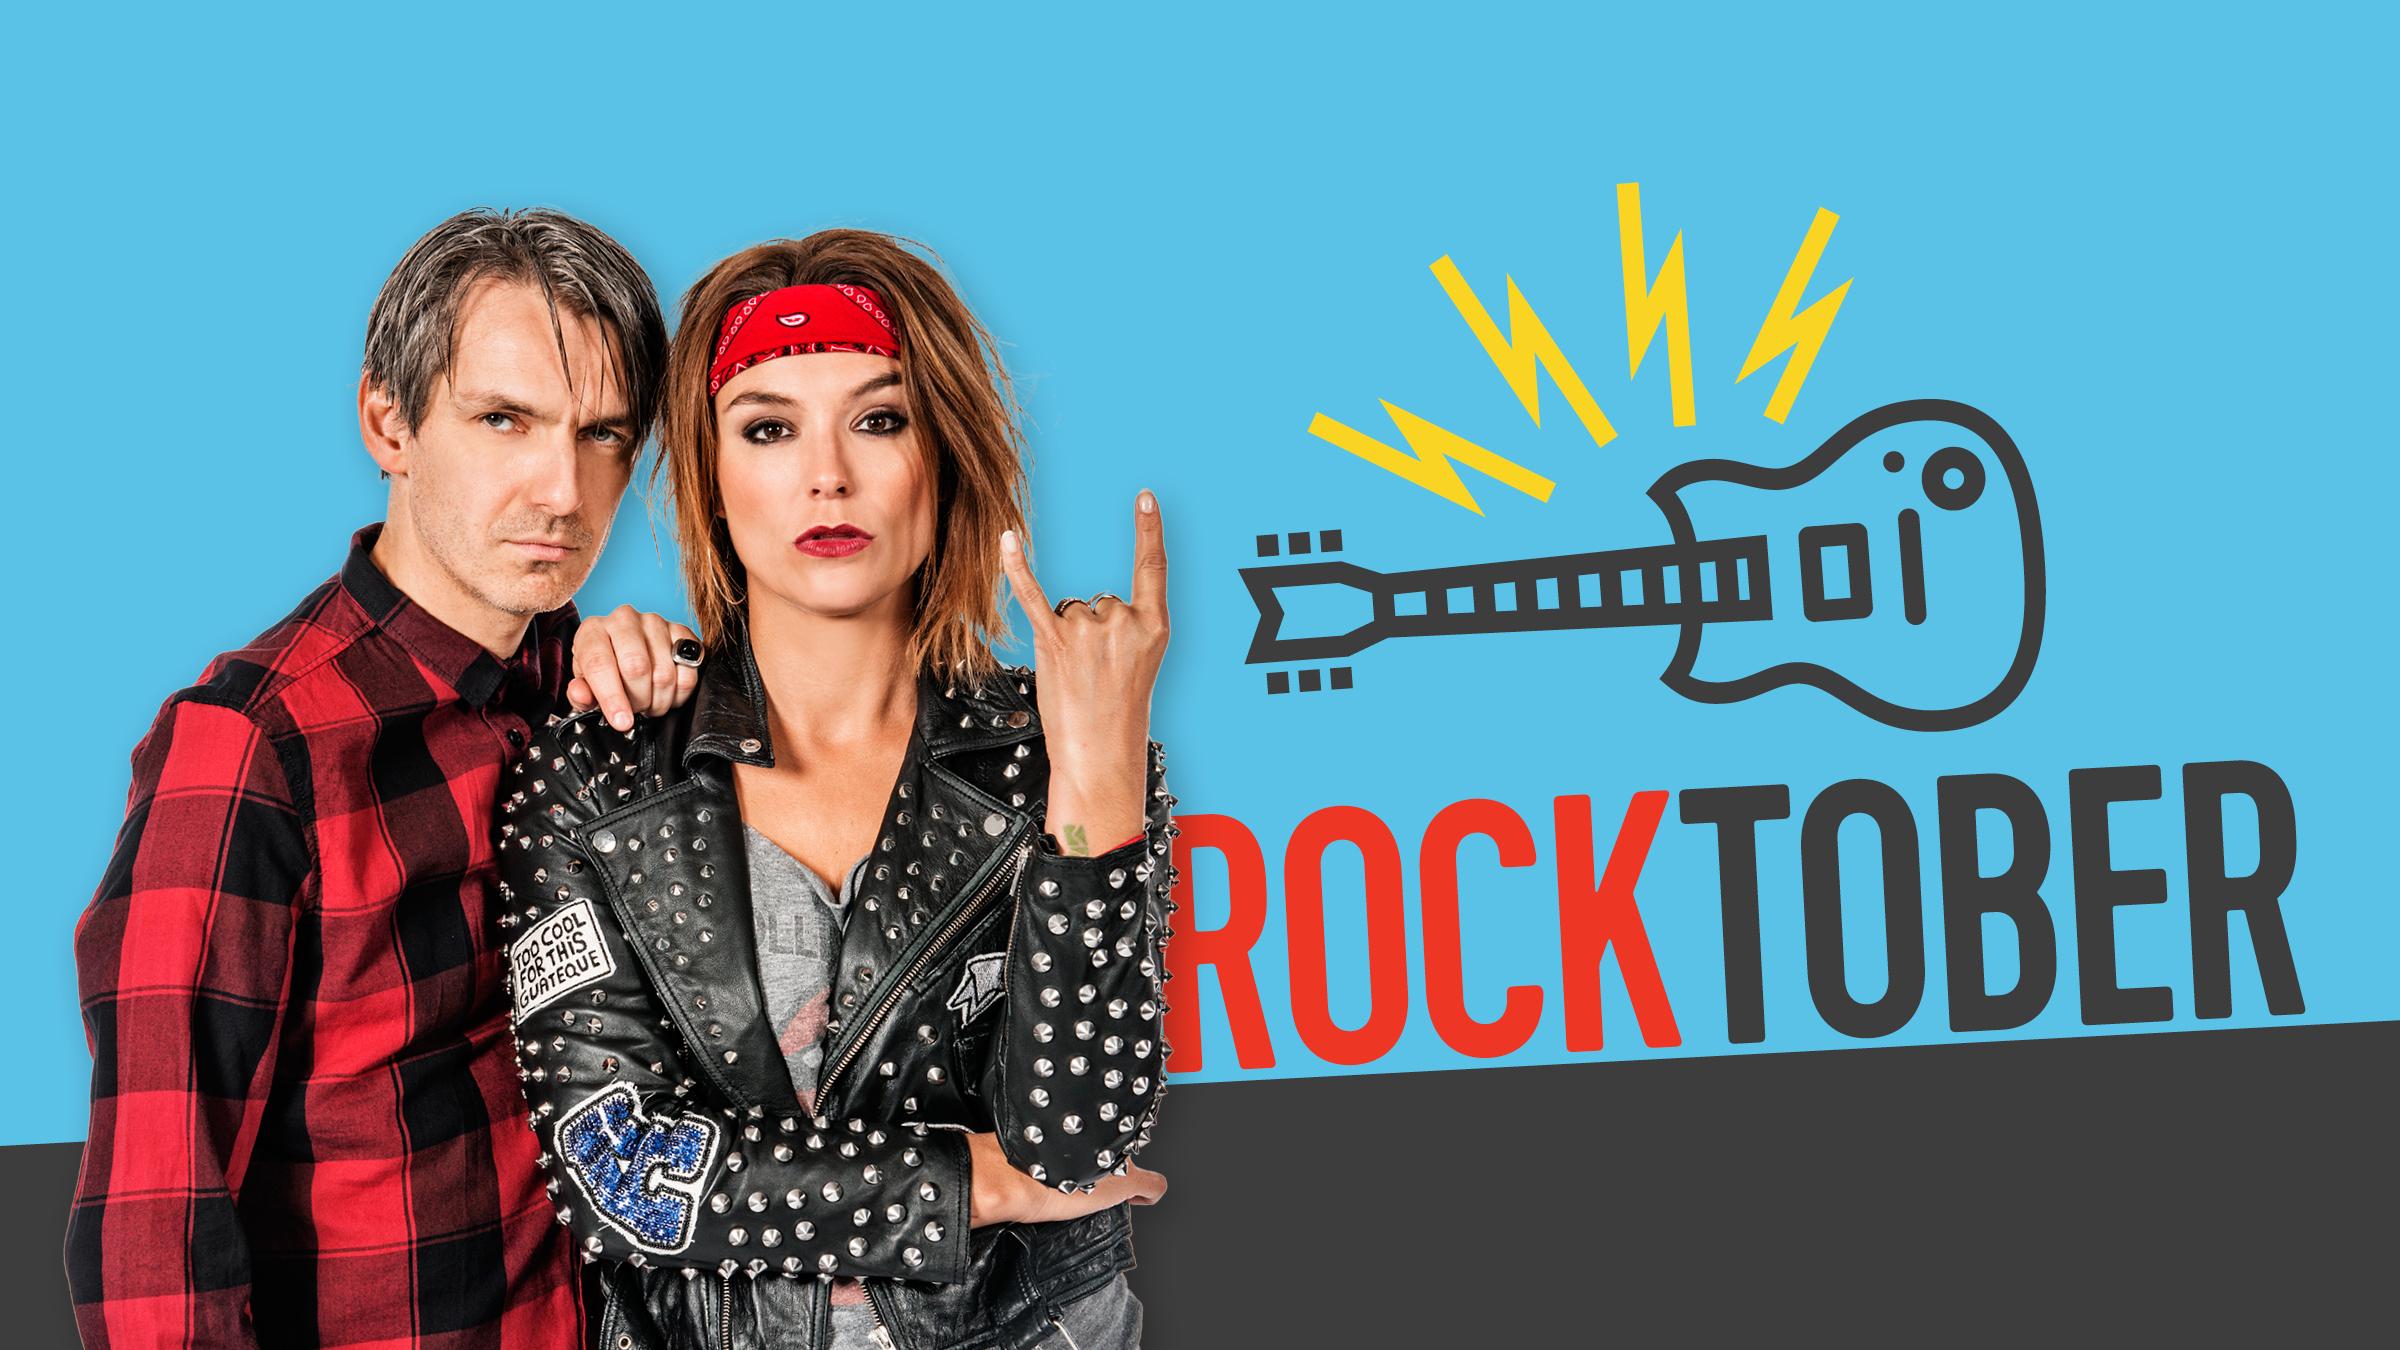 Rocktober 2400x1350